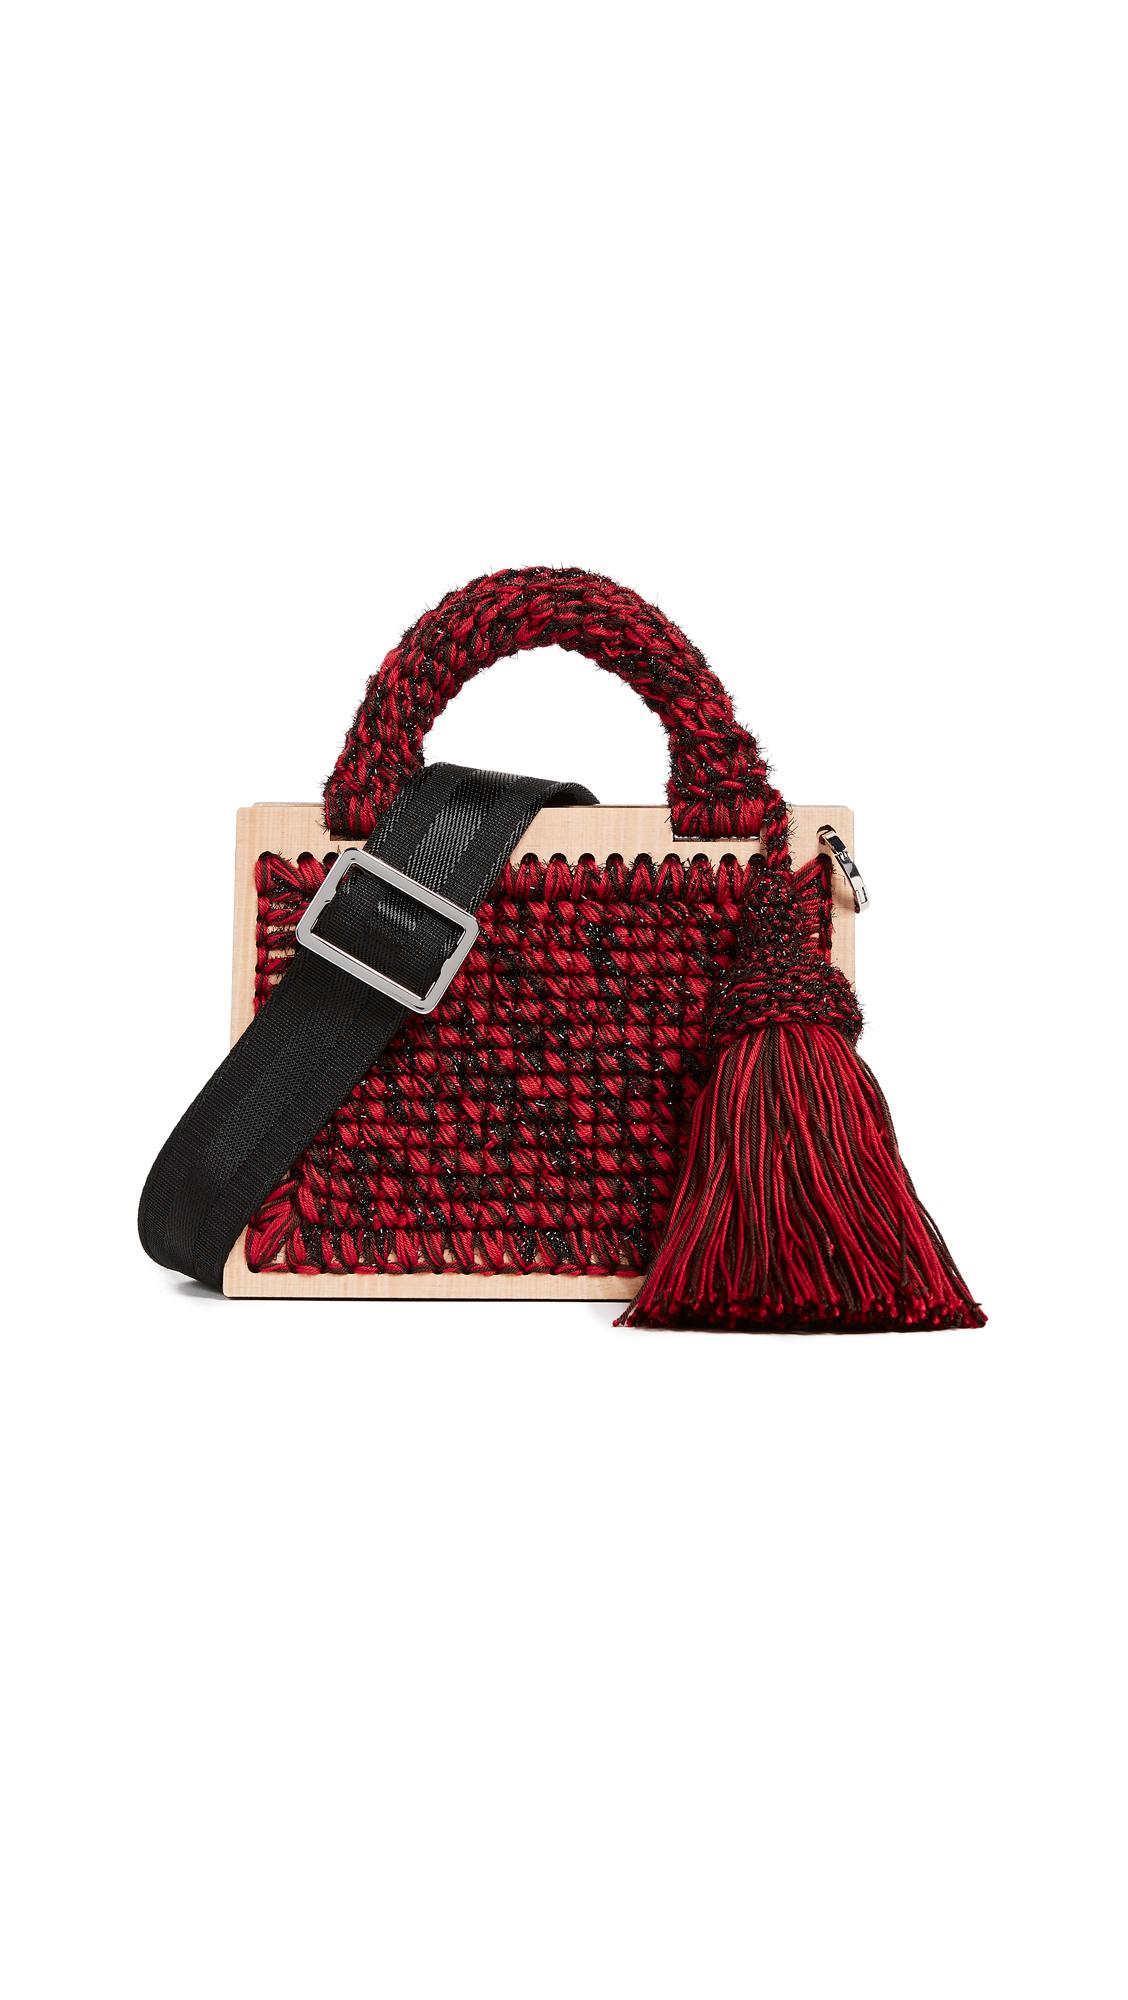 0711 Madame Tardieu St. Barts Purse - Red/Brown/Black